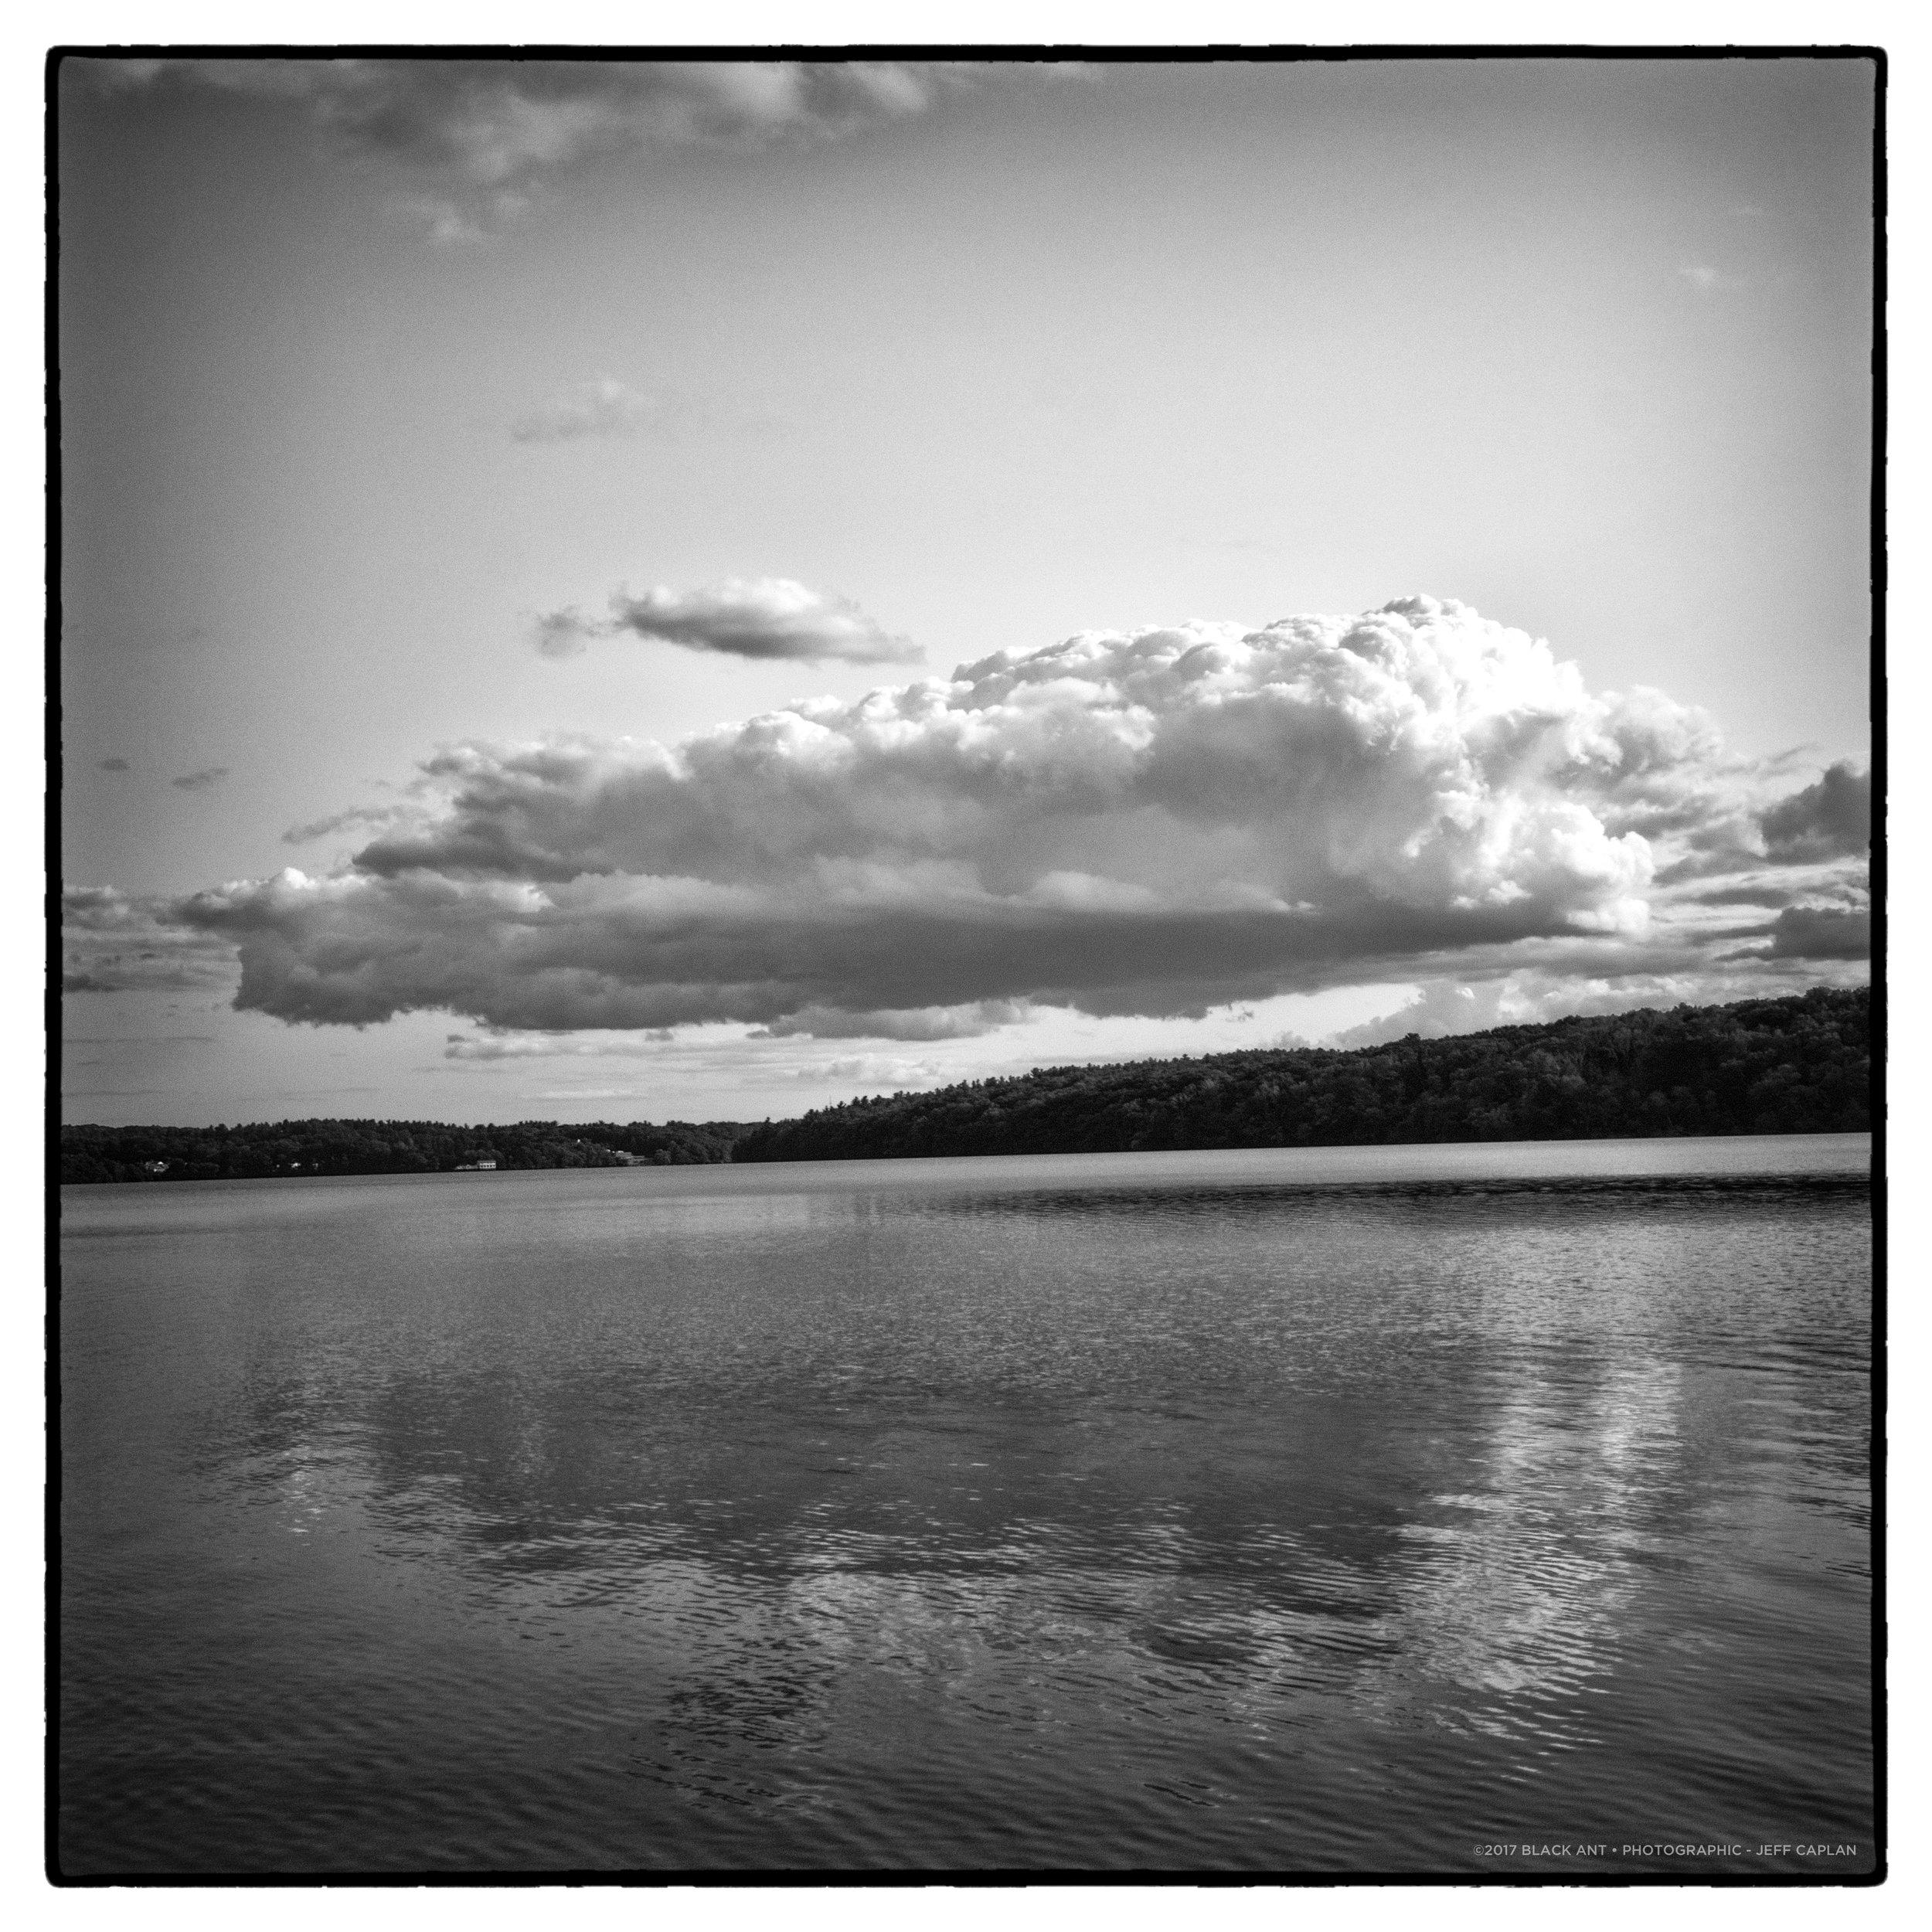 Lake_Cochichewick_N_Andover_MA_Clouds.jpg